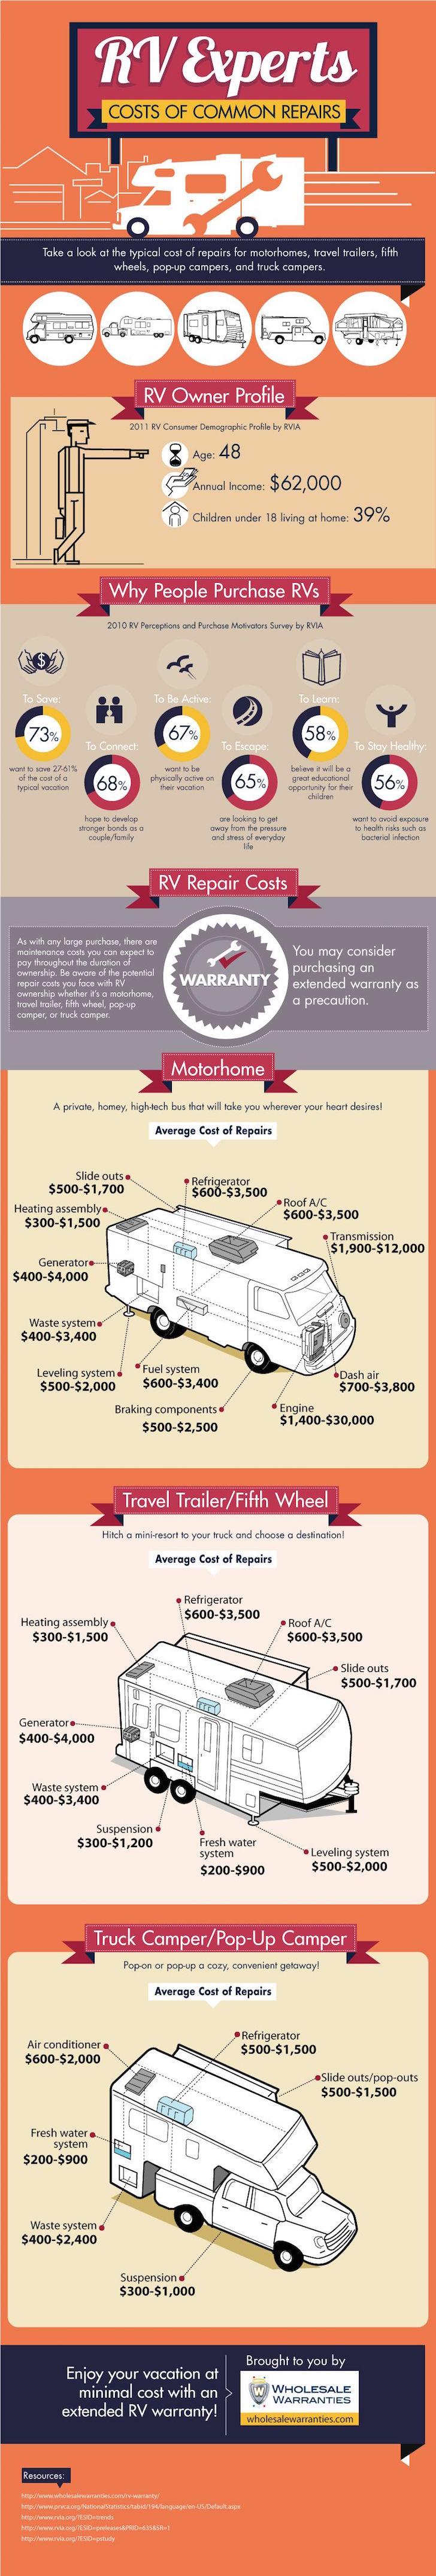 Cost of RV repairs